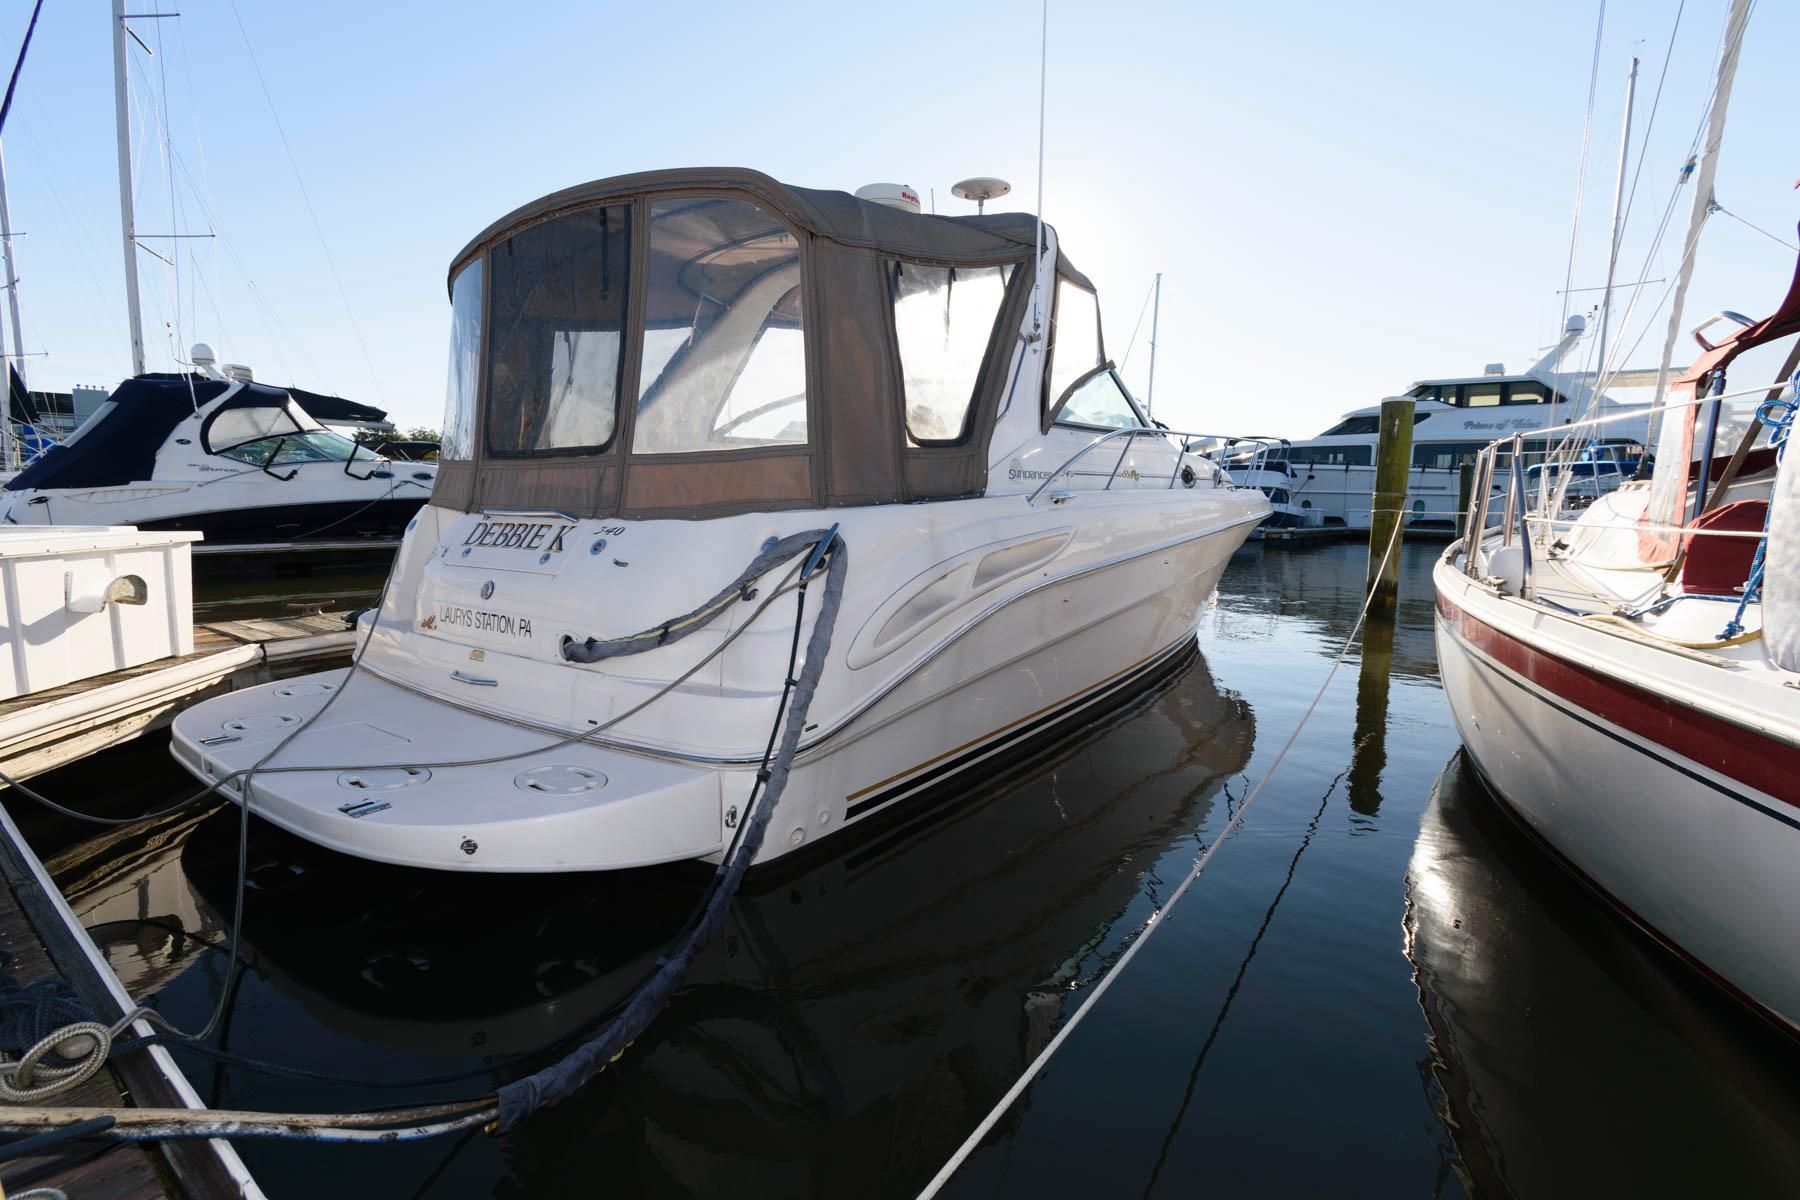 M 5788 JB Knot 10 Yacht Sales